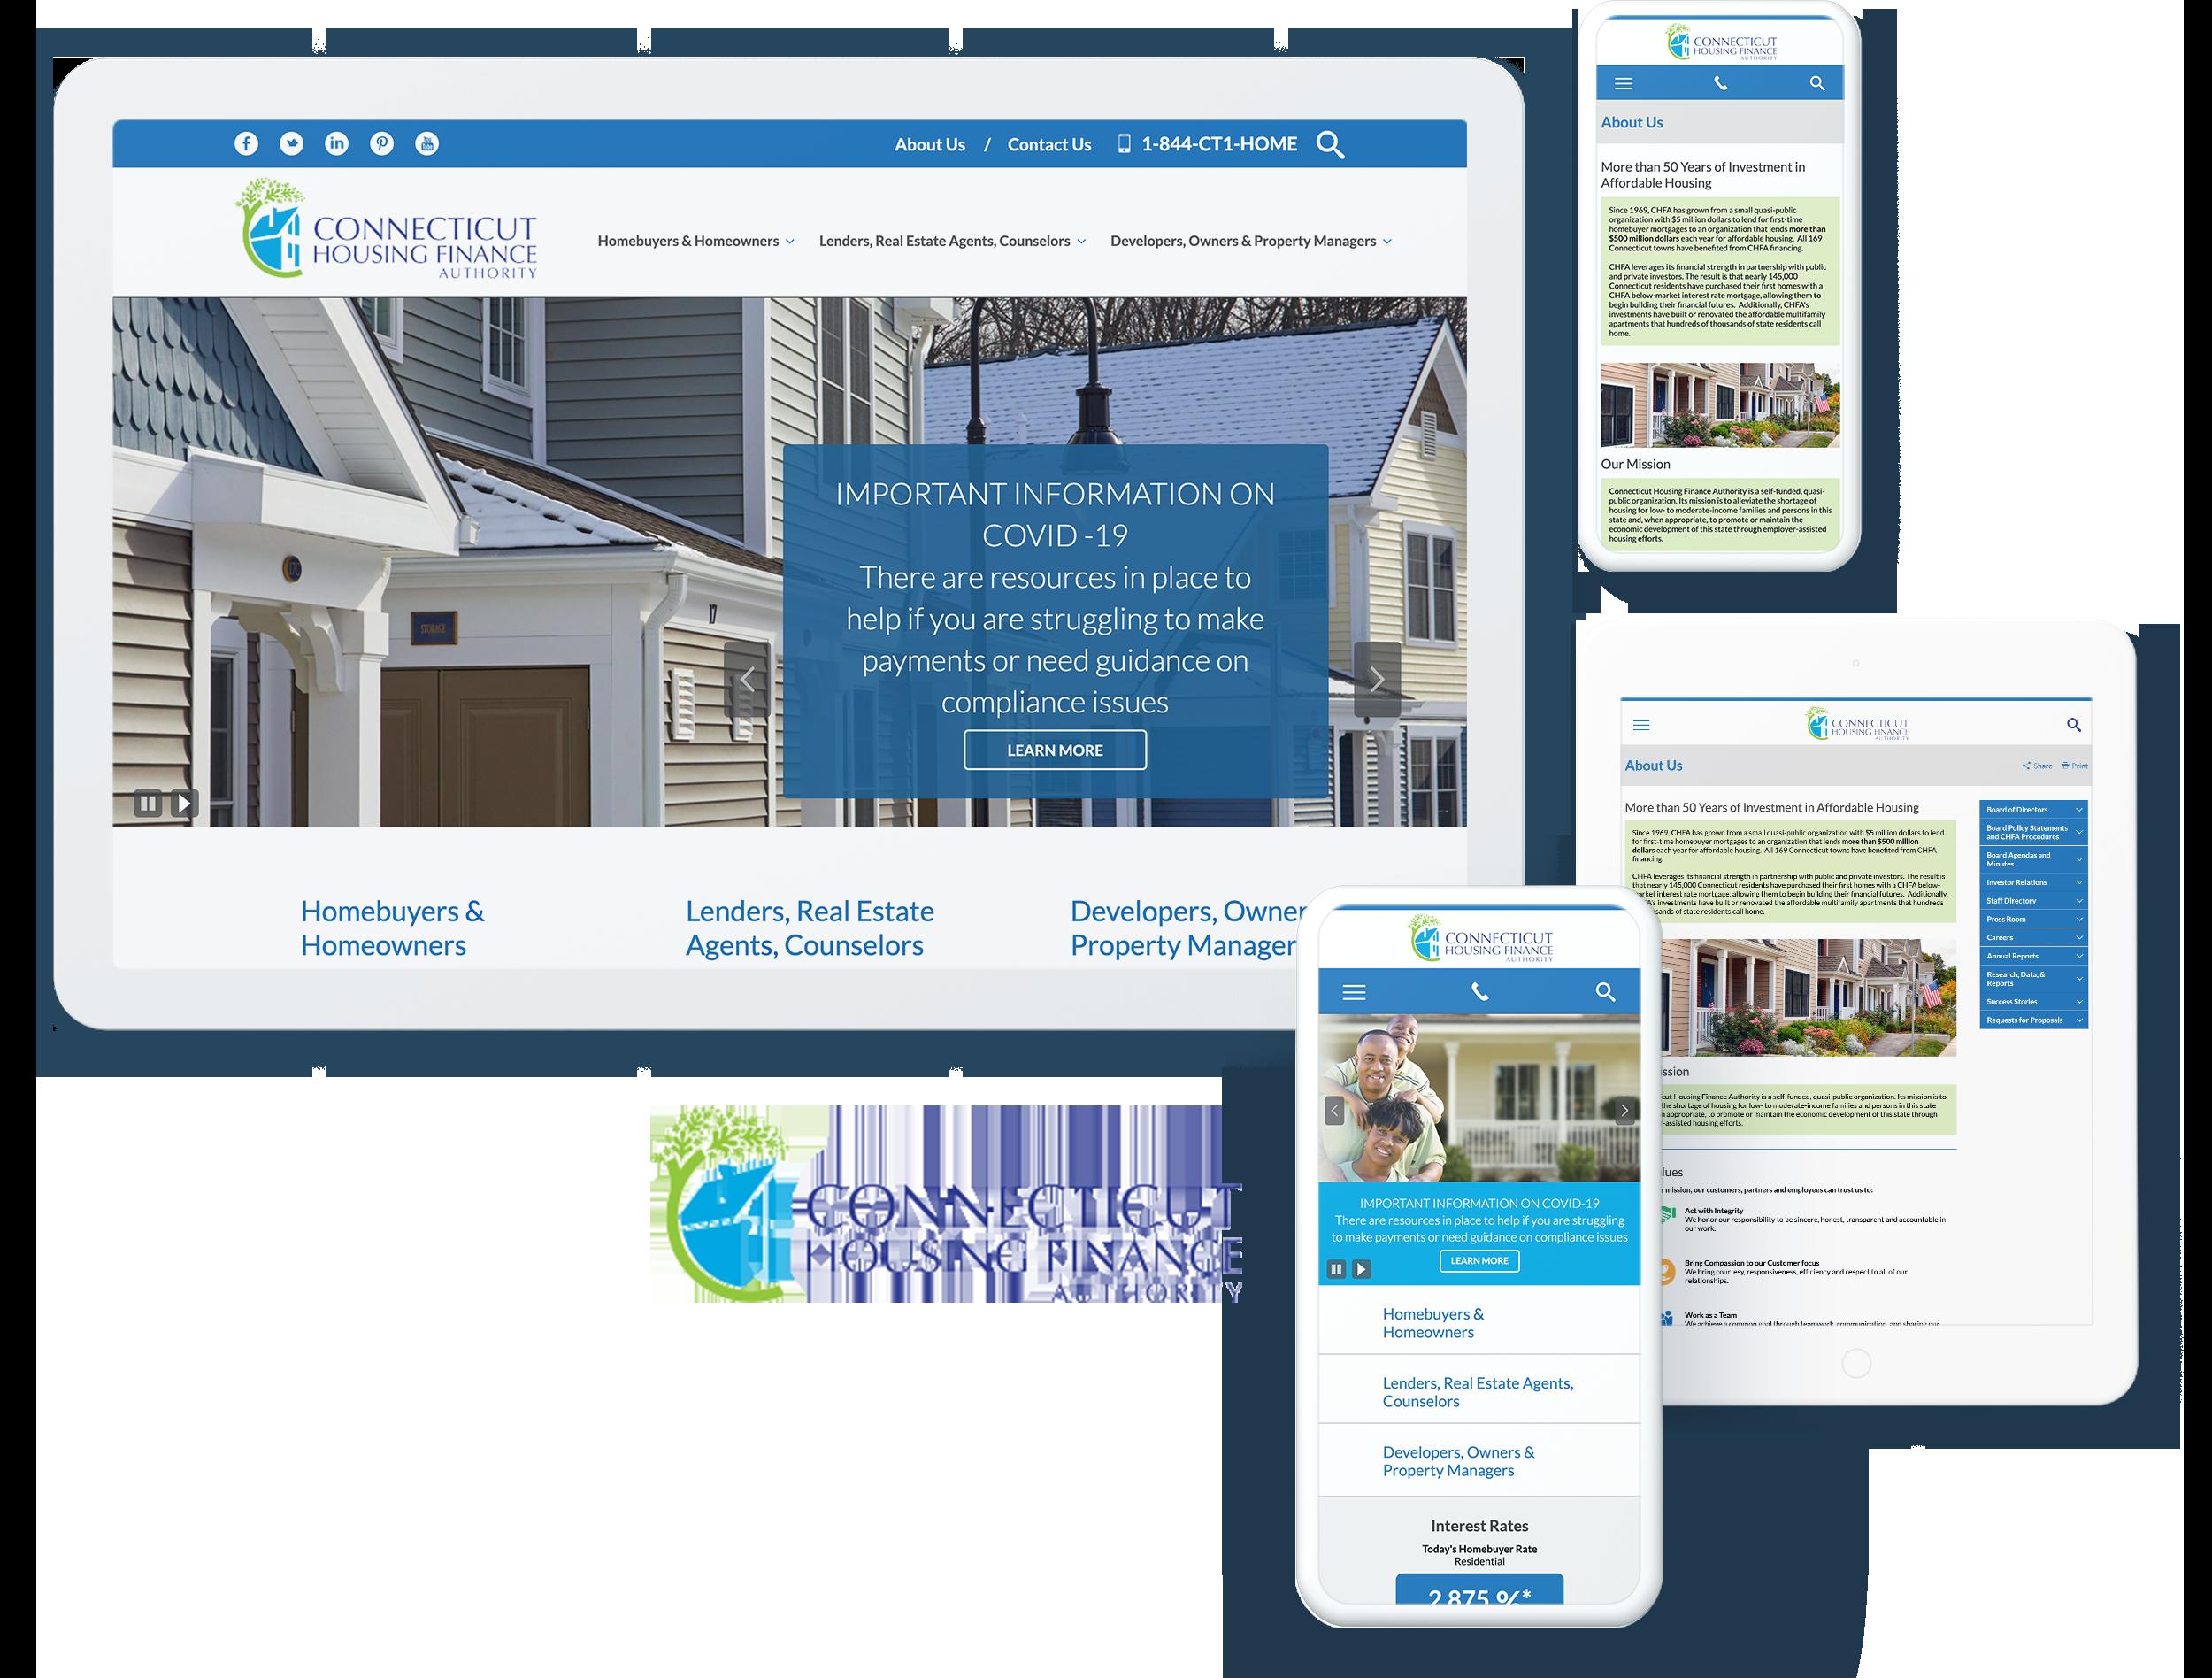 conneticut housing finance authority spotlight